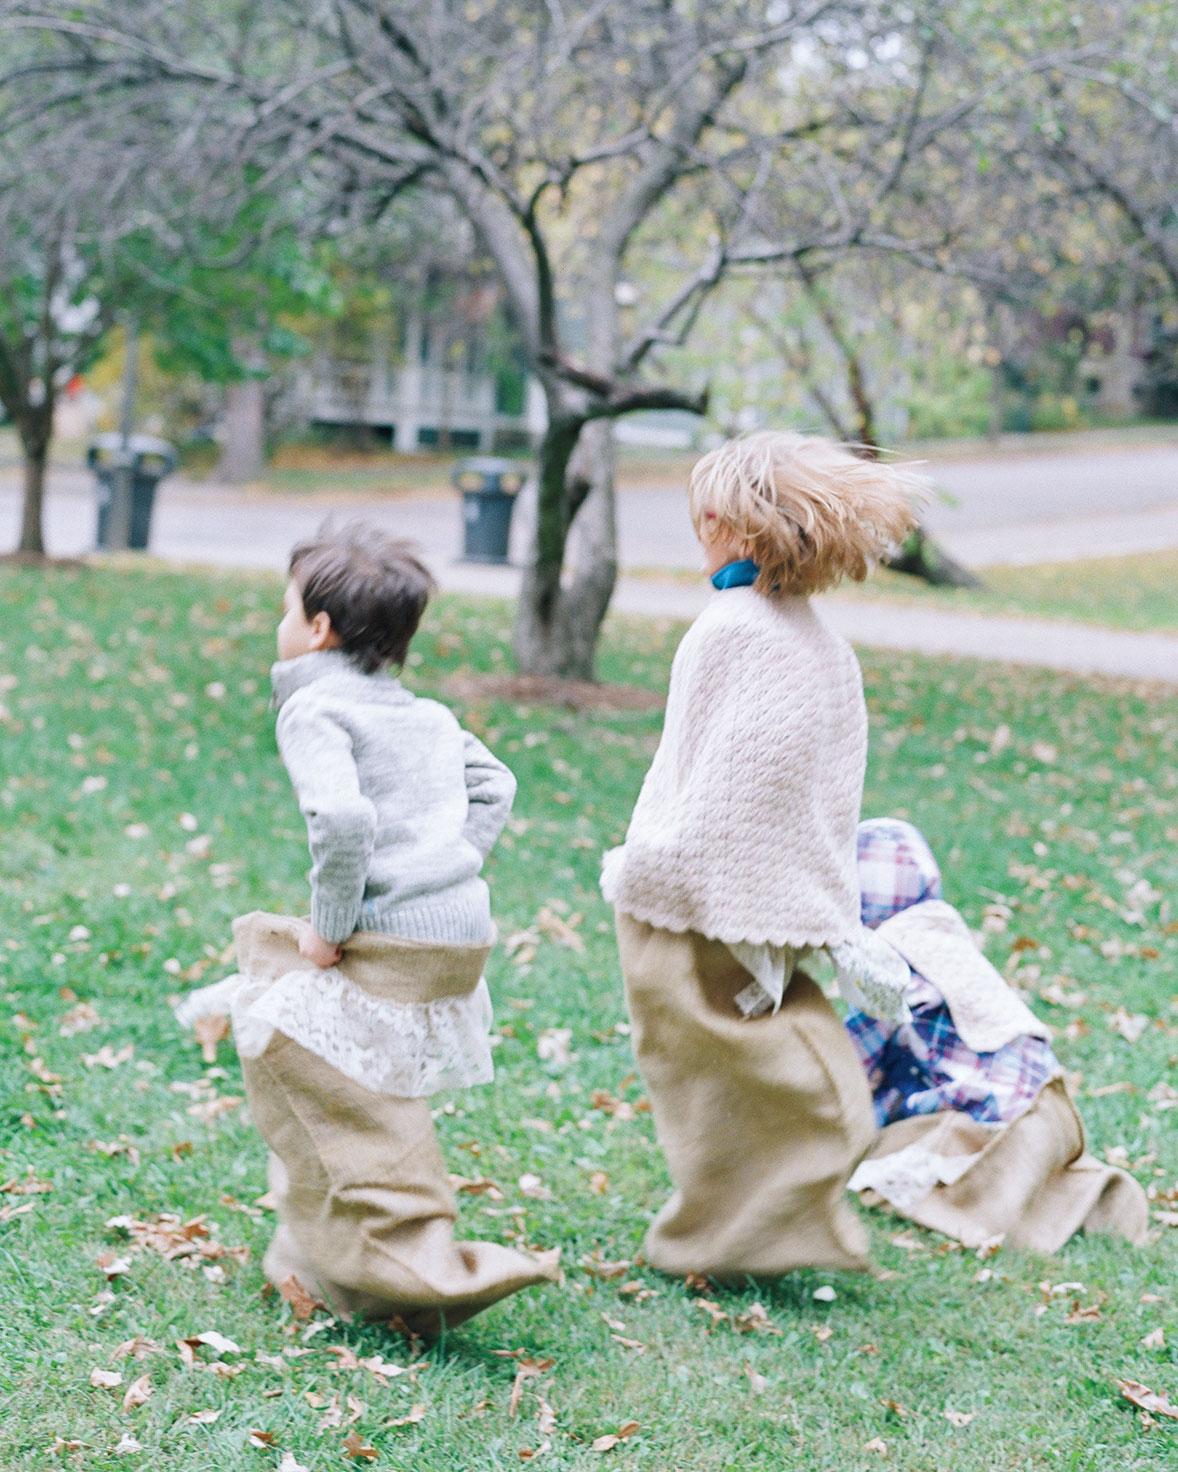 adrienne-jason-wedding-minnesota-kids-bean-bag-racing-0465-s111925.jpg